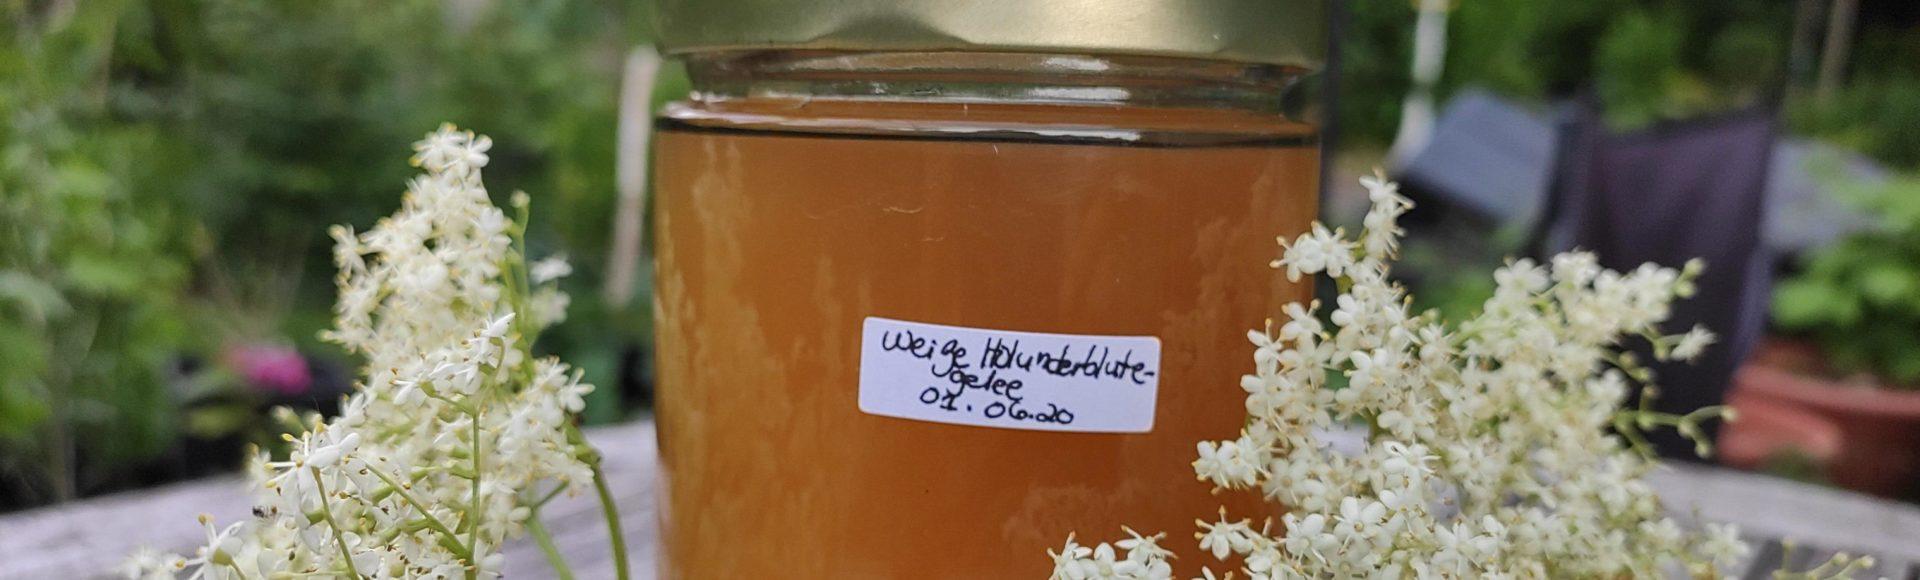 Holunderblüten-Apfelsaft-Gelee selbst herstellen